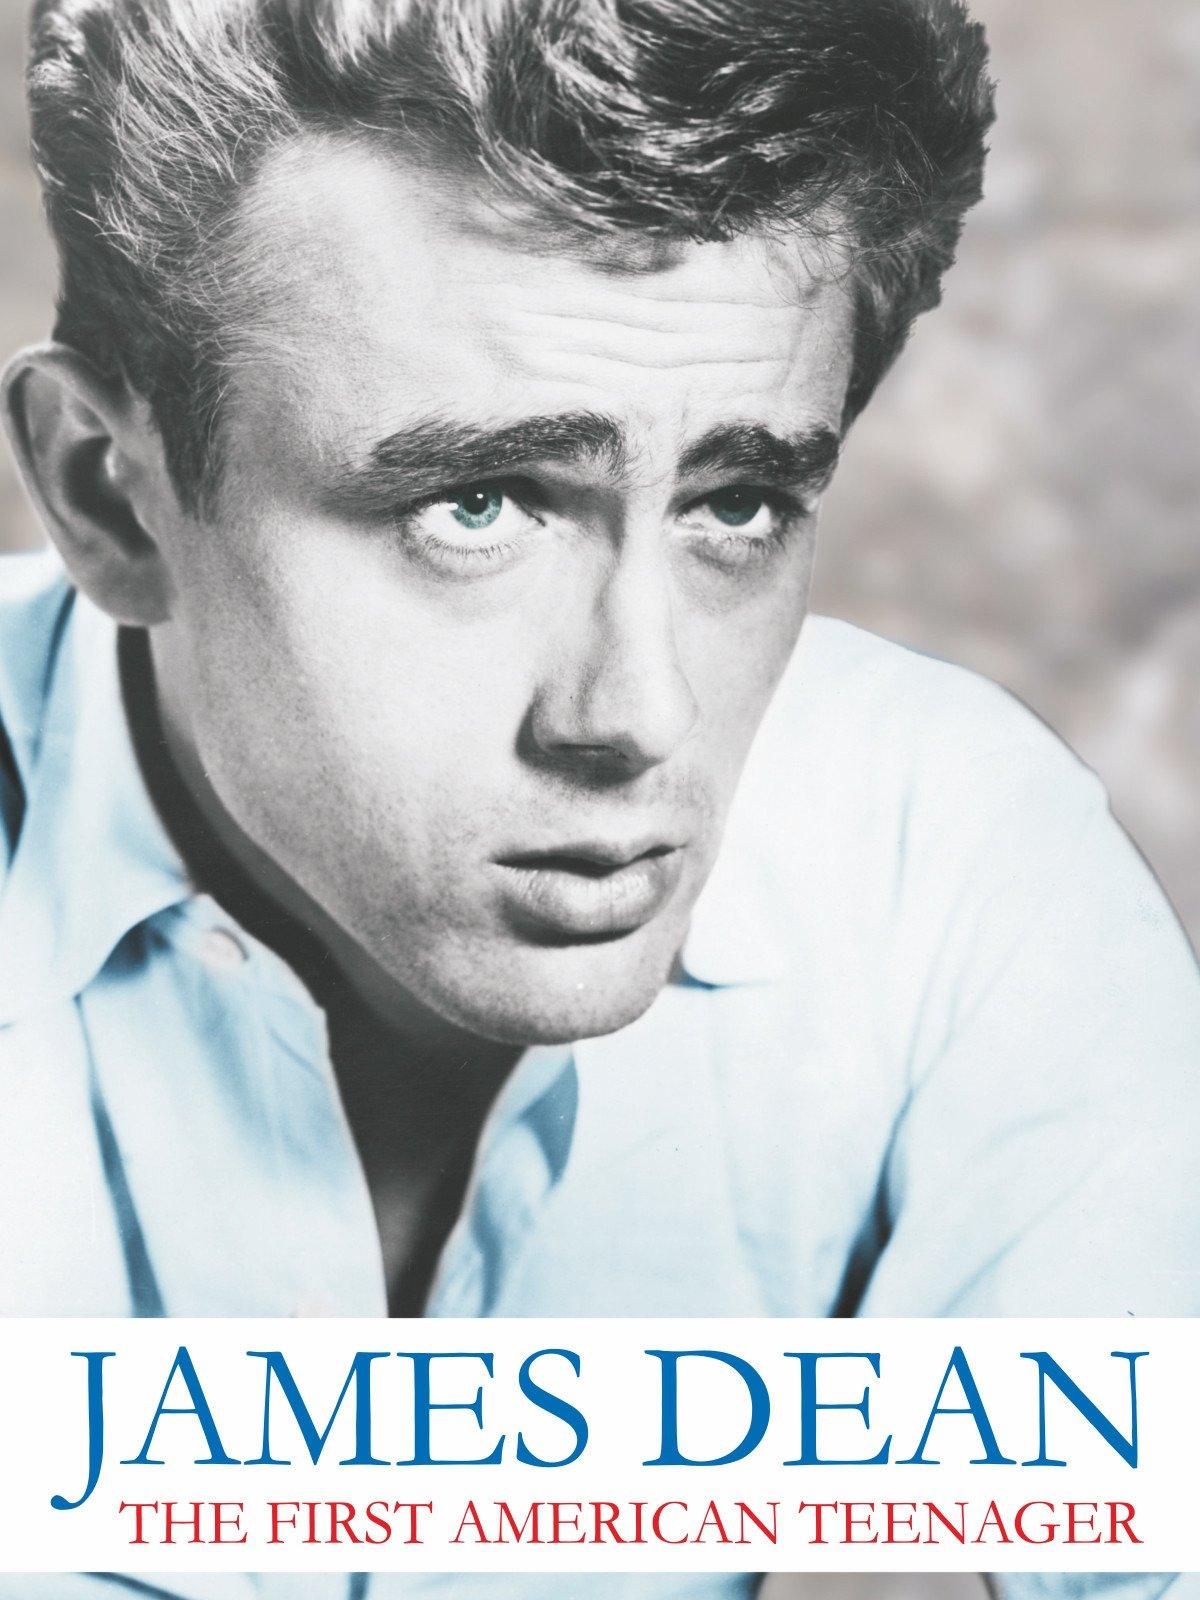 James Dean - First American Teenager